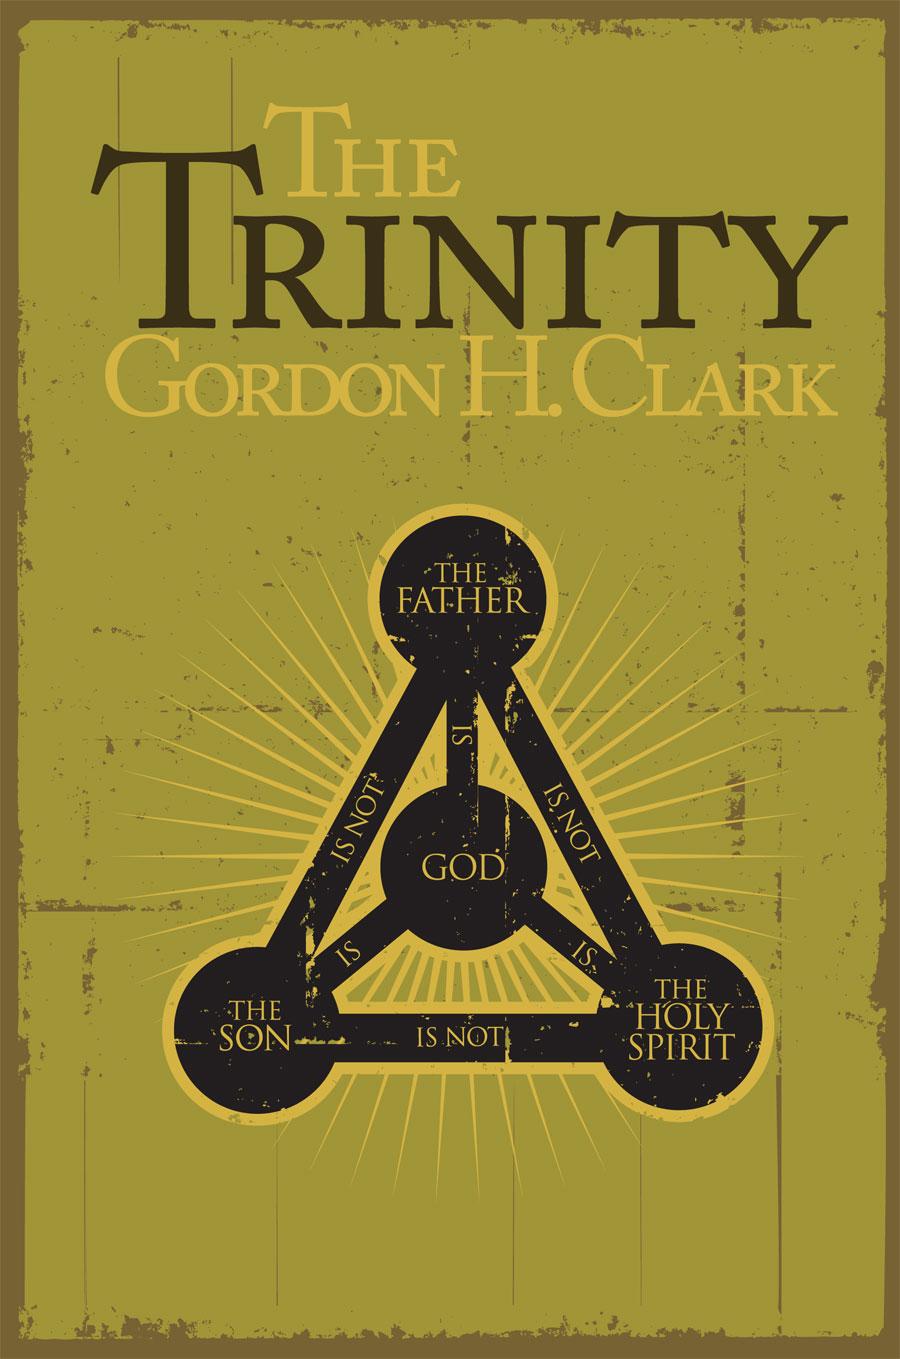 Reformed Theology Trinity Foundation - Counterfeit Gospels (John W. Robbins)  Calvinism